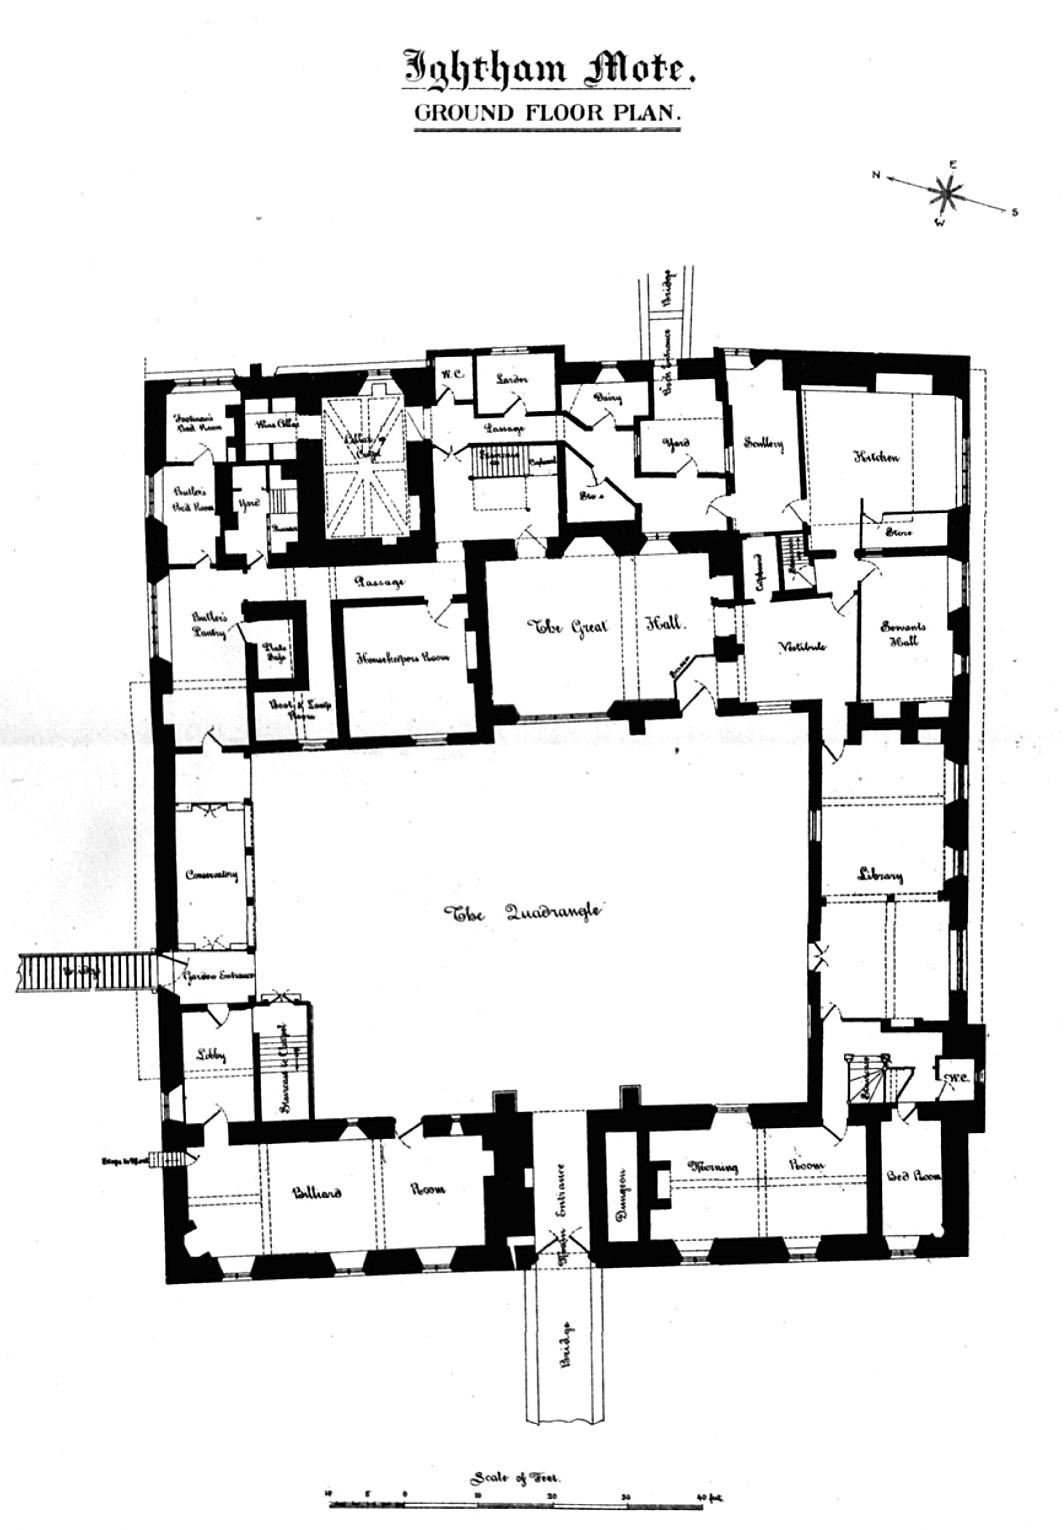 Ightham Mote Ground Floor Plan Wikipedia